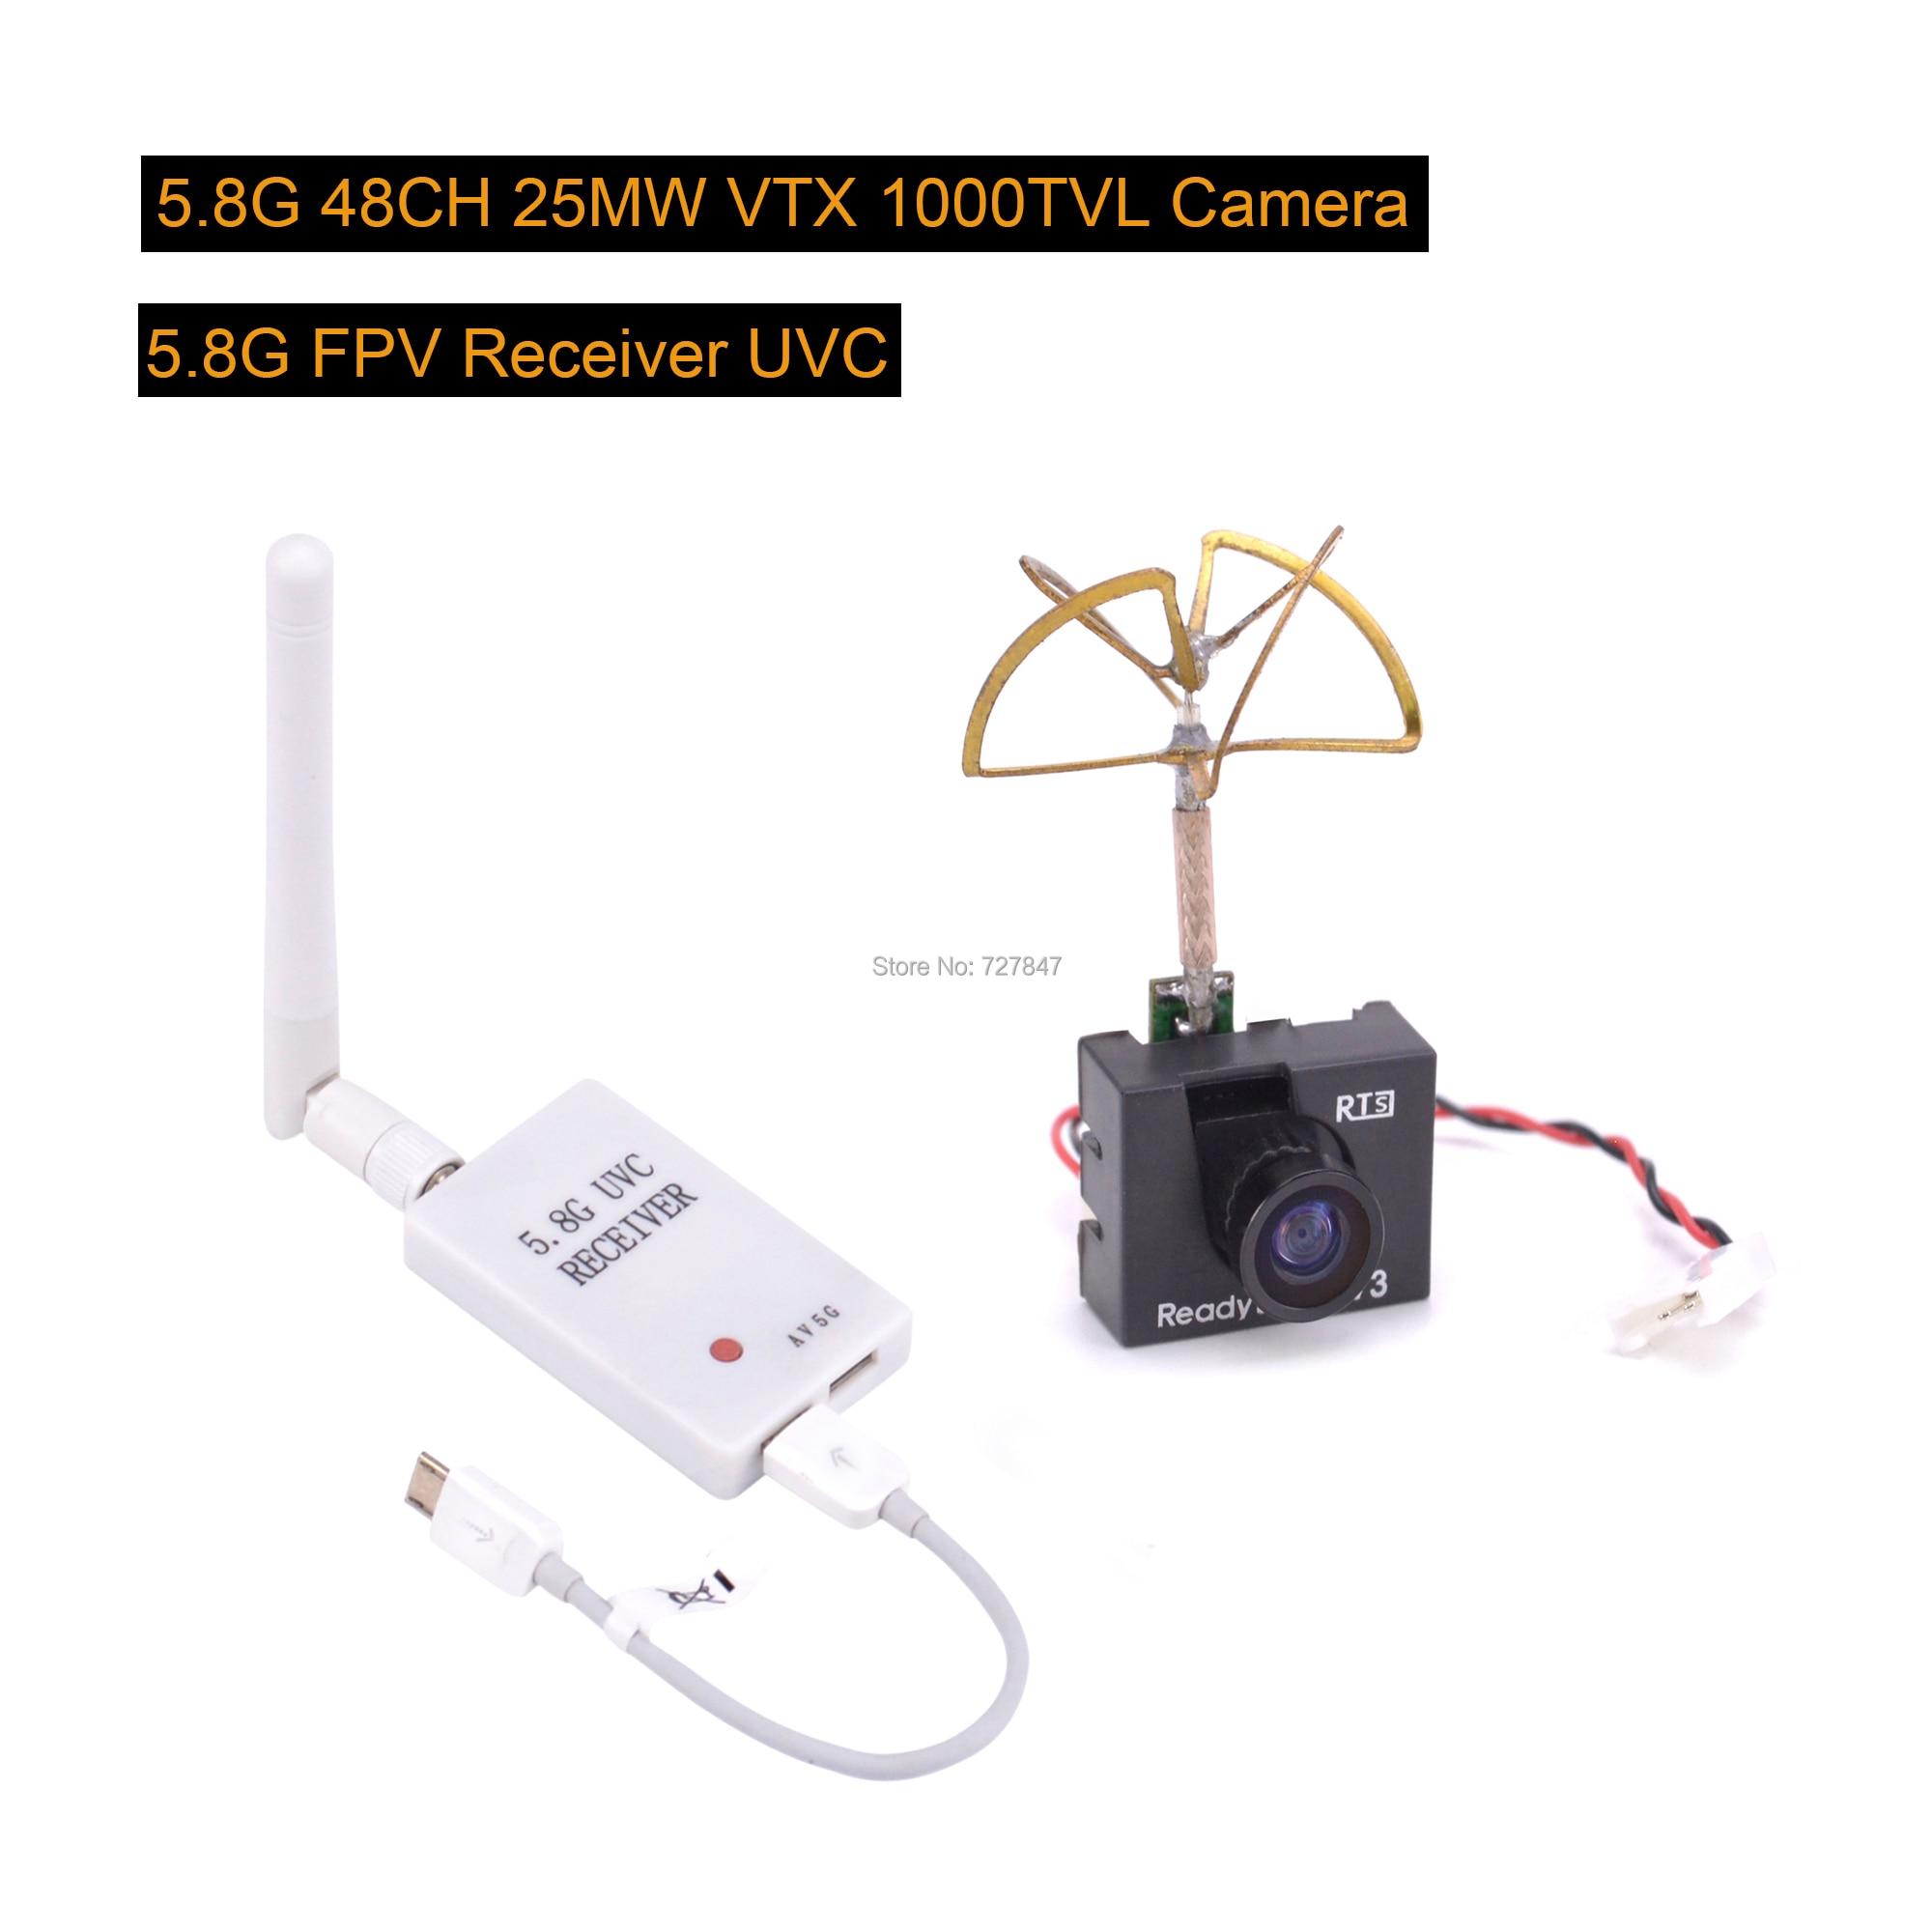 Mini 5,8G FPV Empfänger UVC Video Downlink OTG VR + Readytosky 5,8G 48CH 25 MW VTX 1000TVL FPV kamera Eingebautem Sender